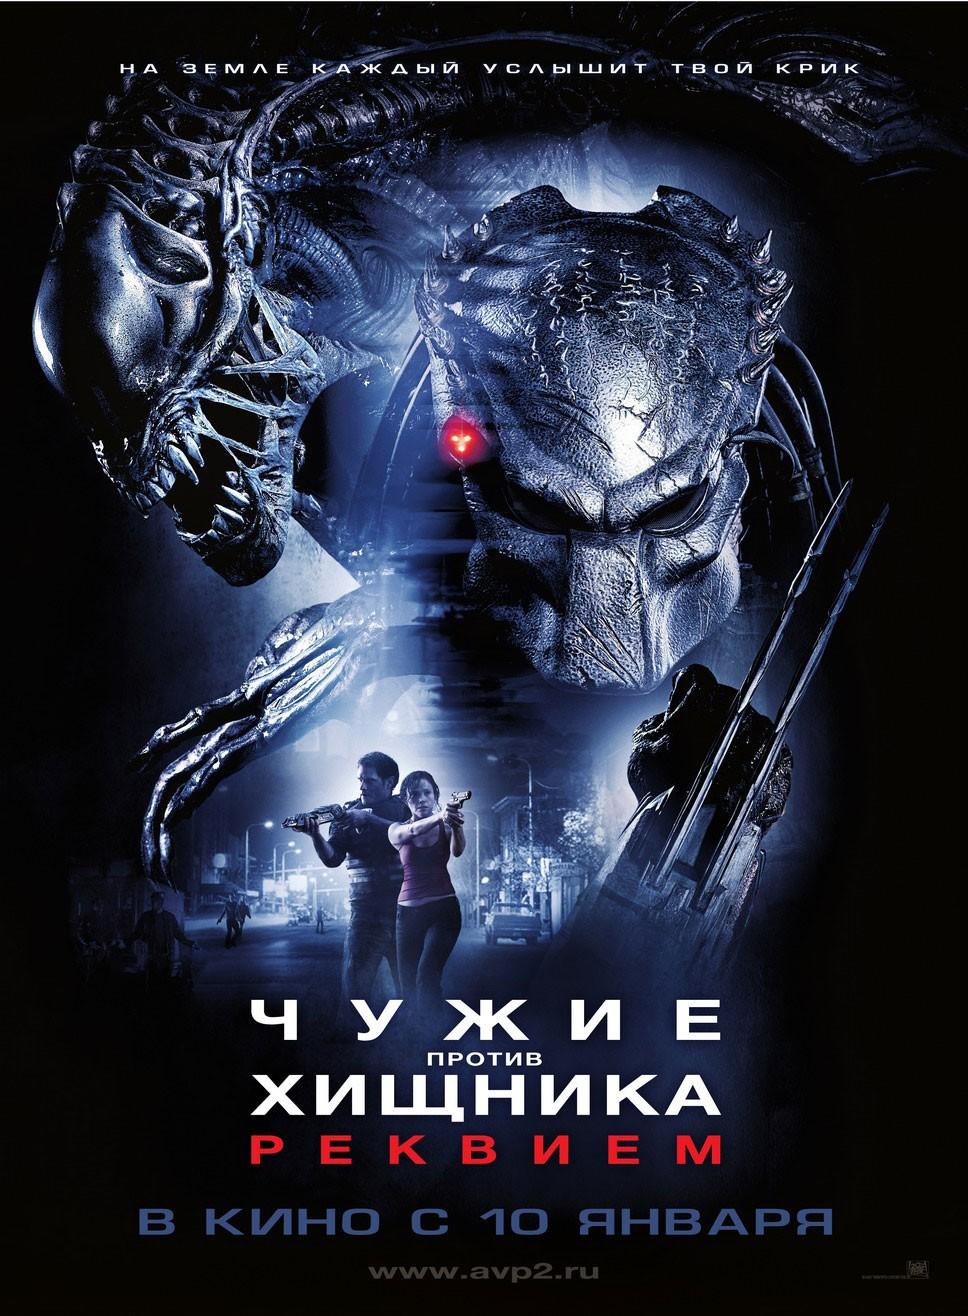 kinozubr.net